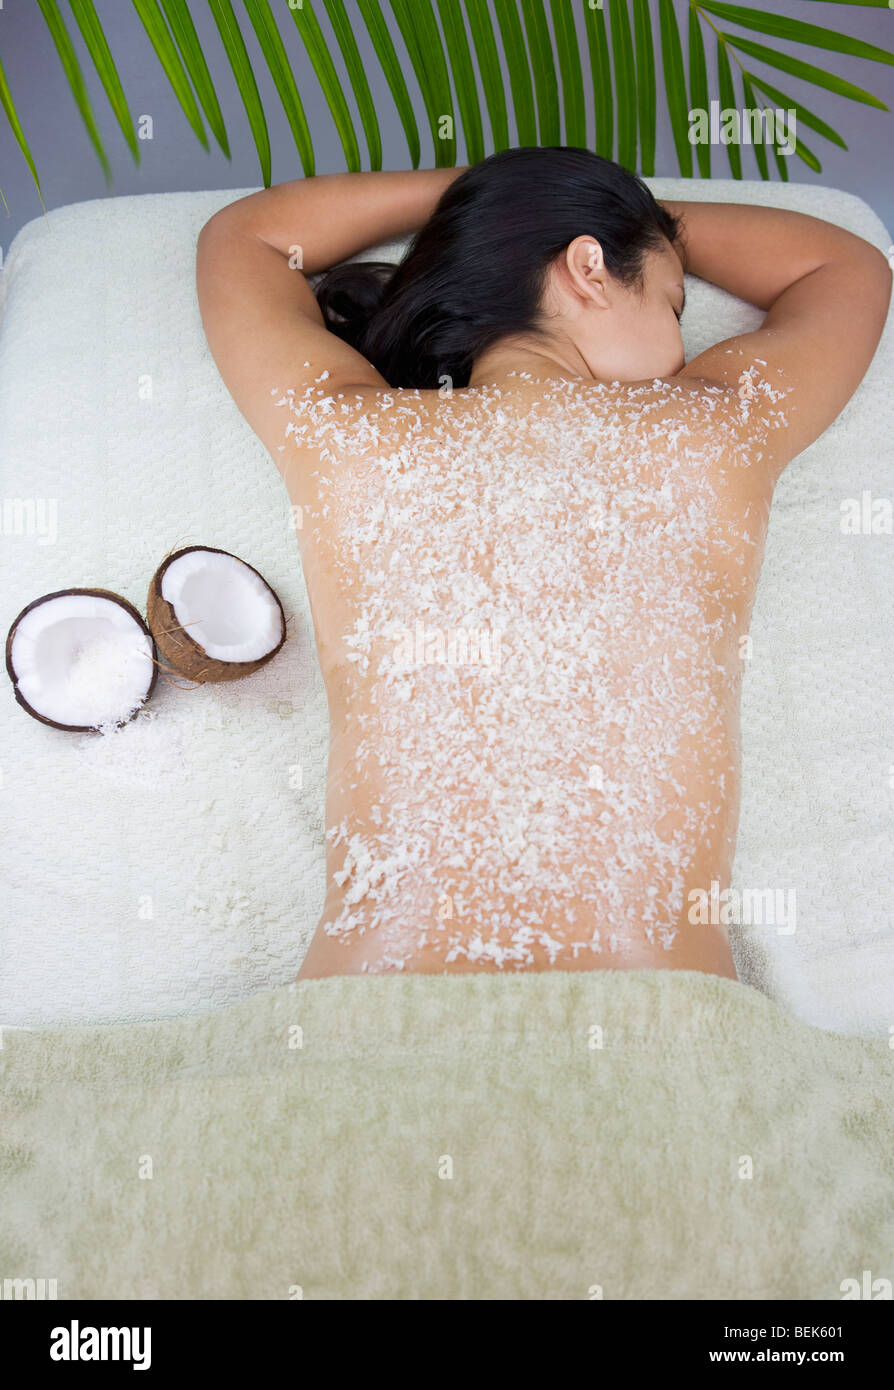 Frau, die eine Bio Peeling-Behandlung Stockbild